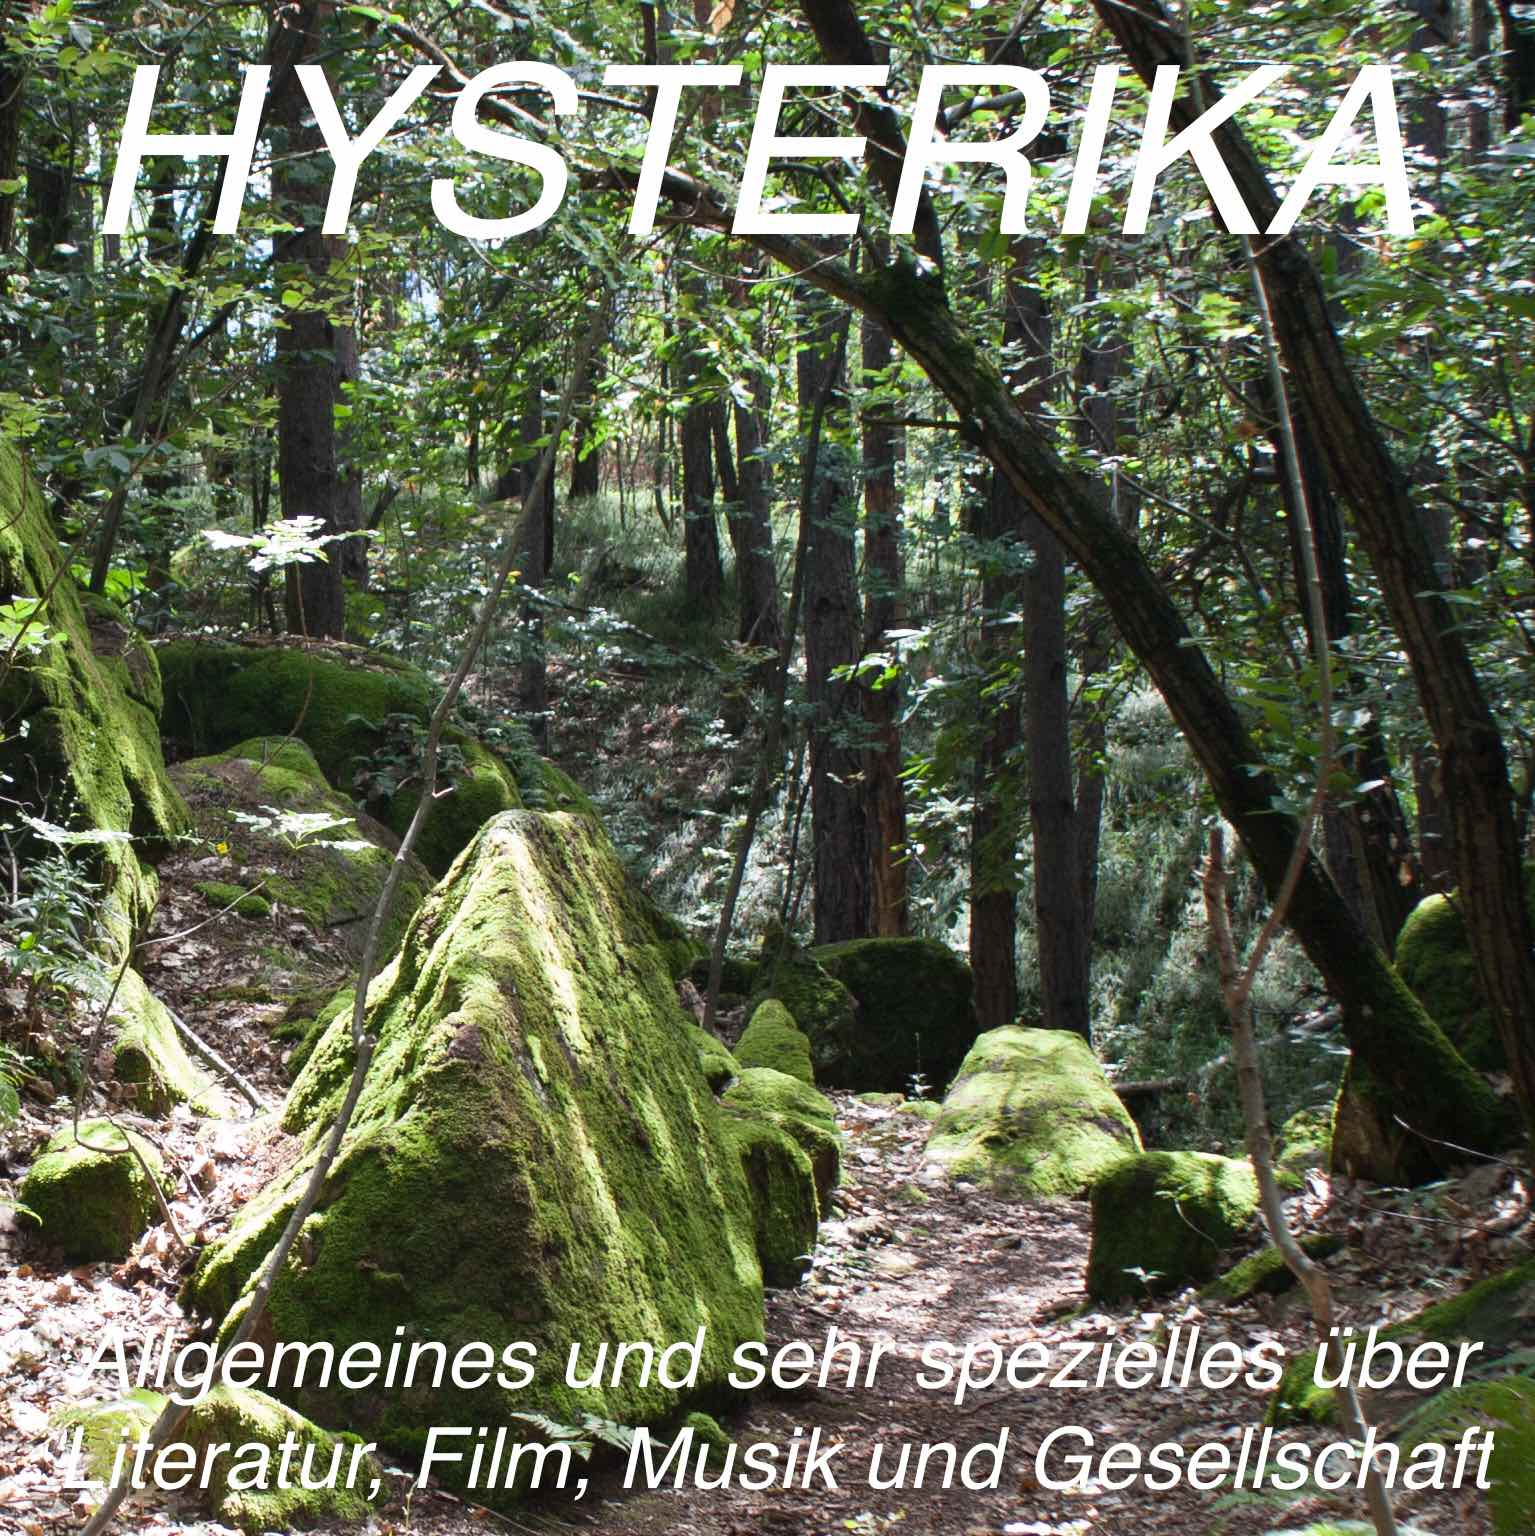 Hysterika